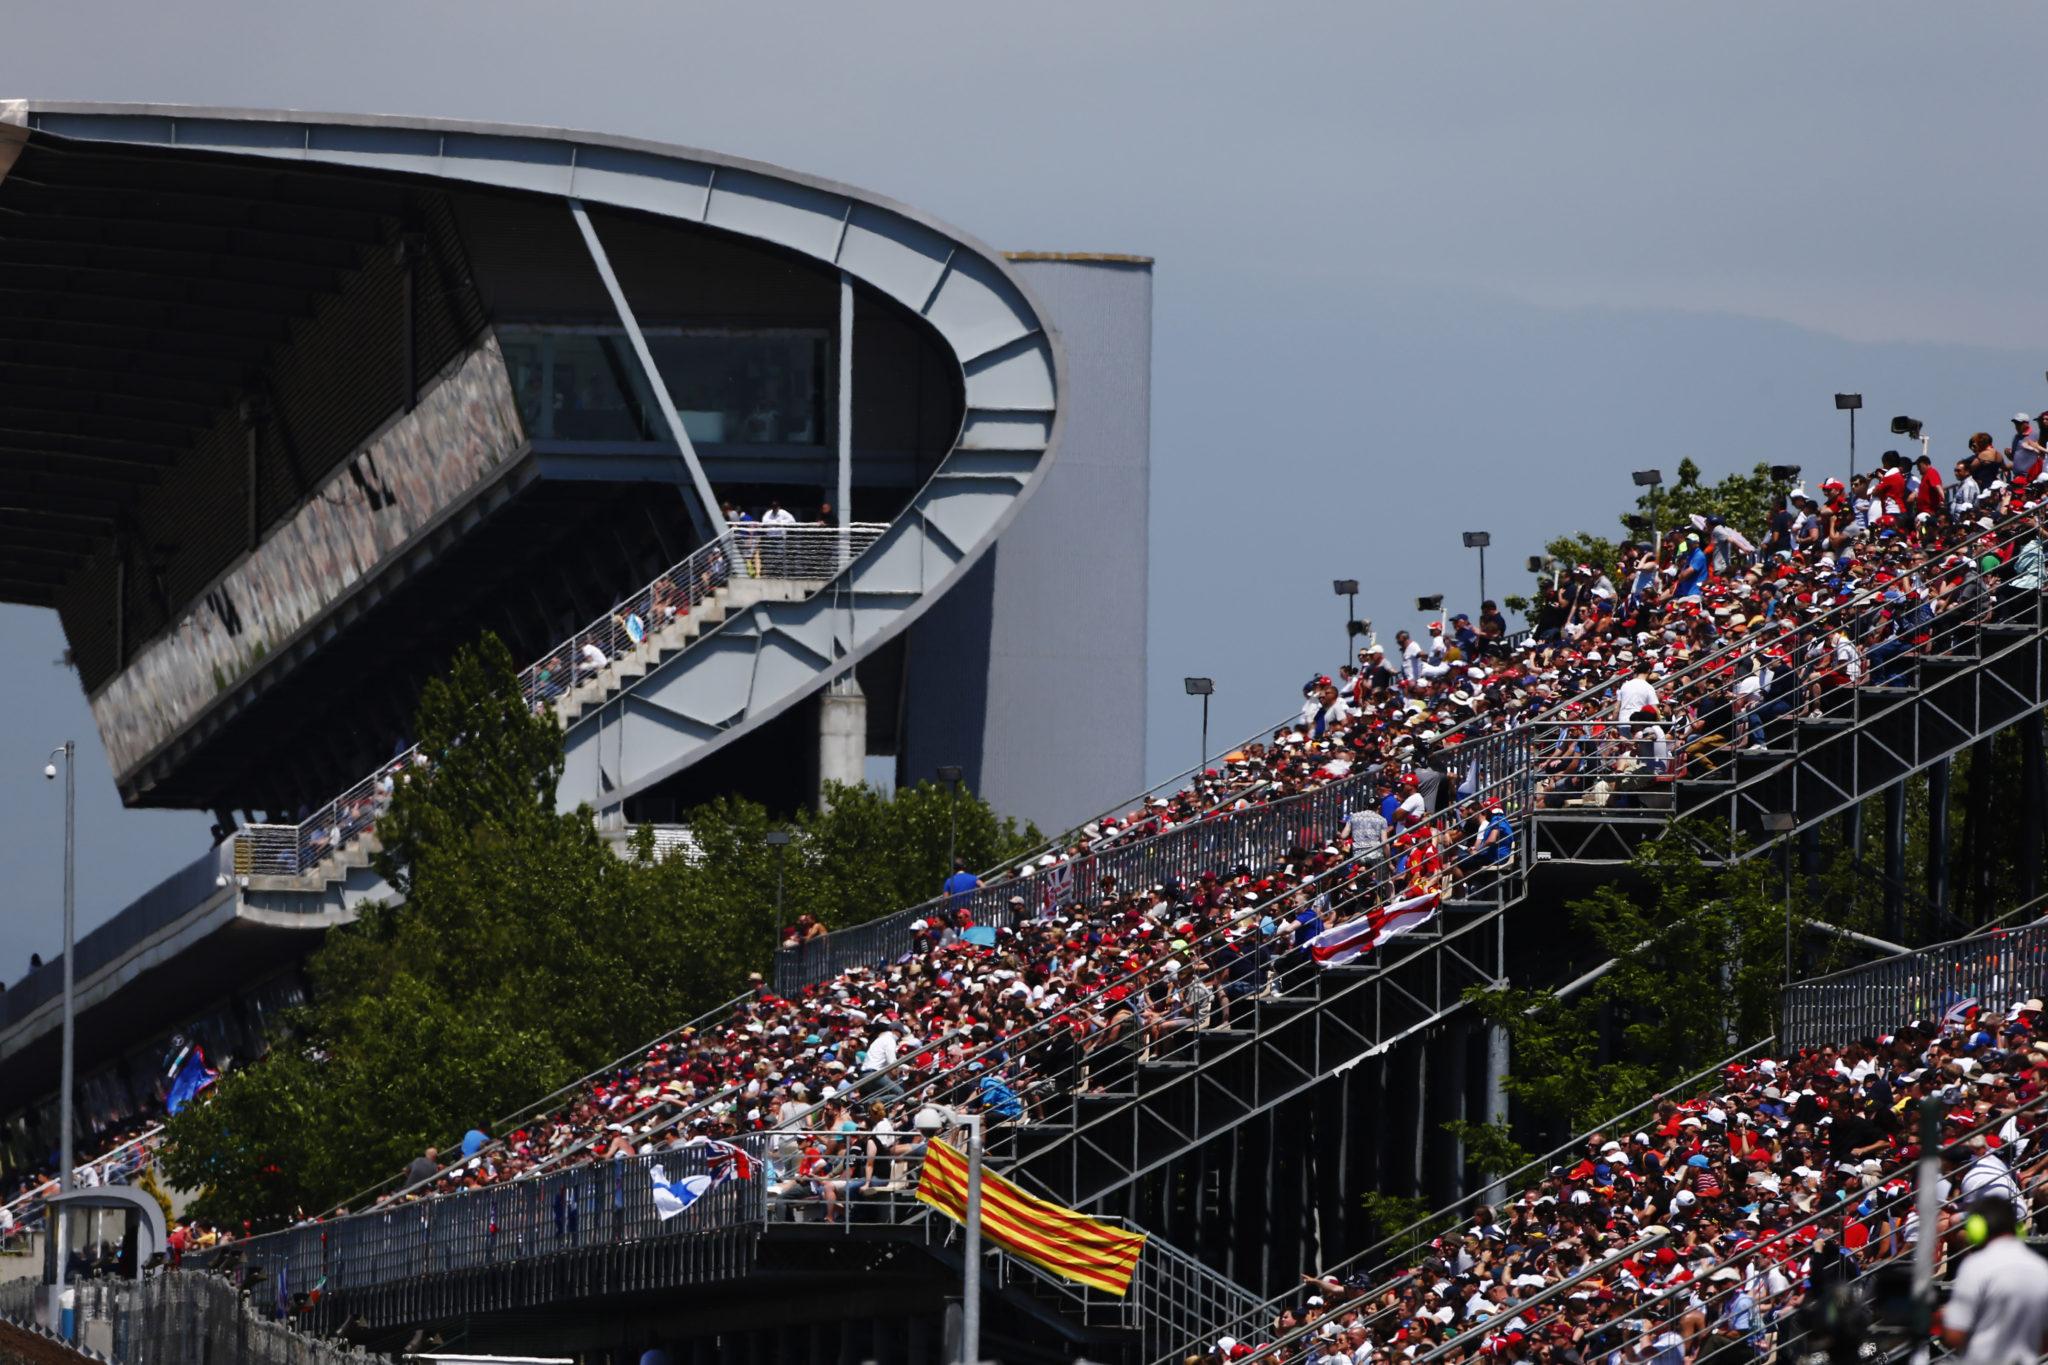 F1 Grandstand at the Spanish Grand Prix